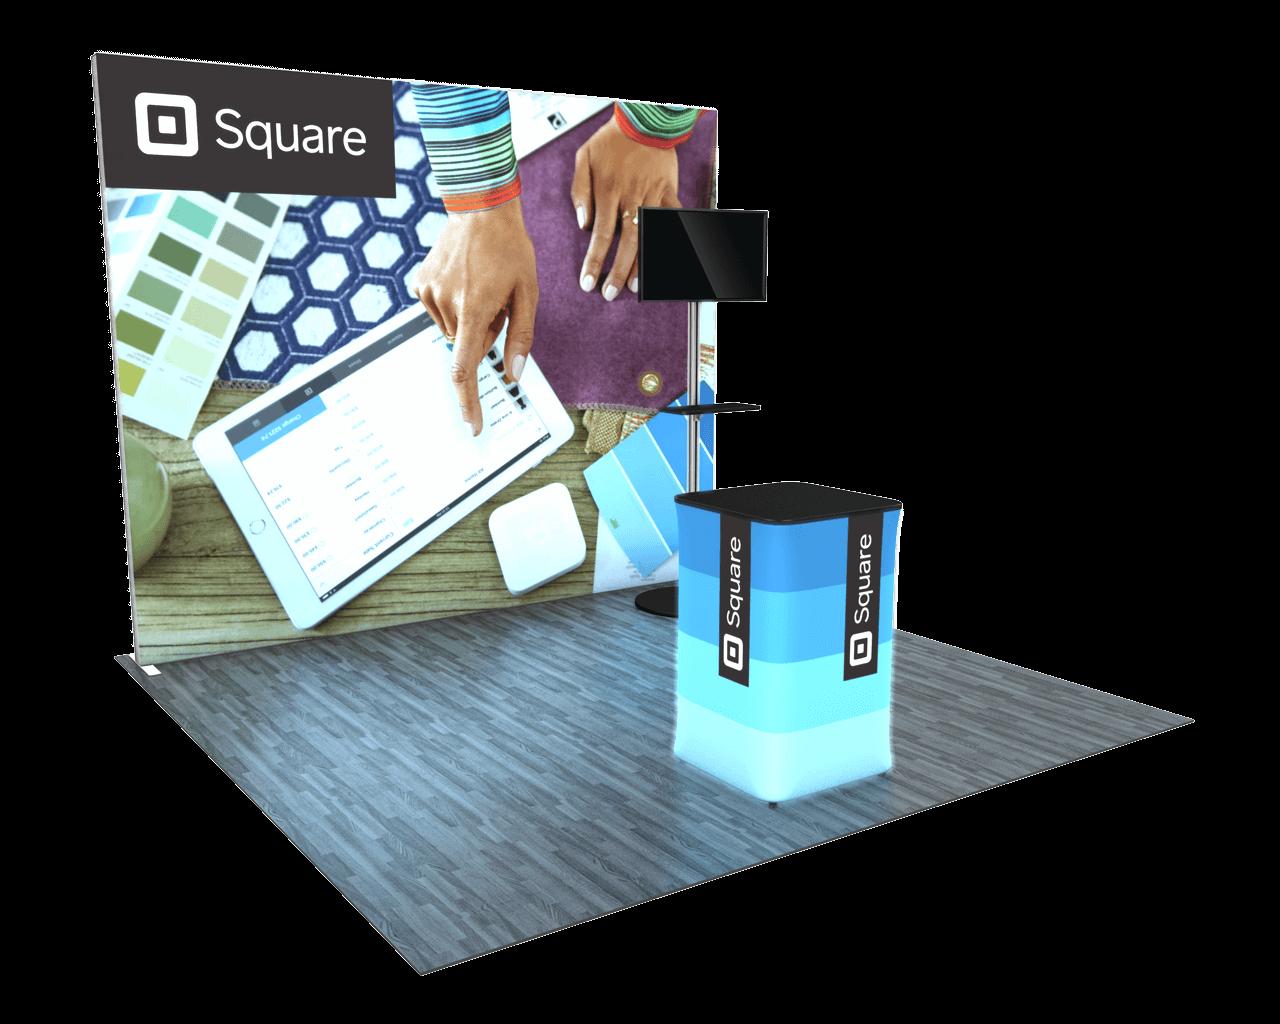 Infinity Pro Backlit 10ft Trade Show Display Kit - 10.06